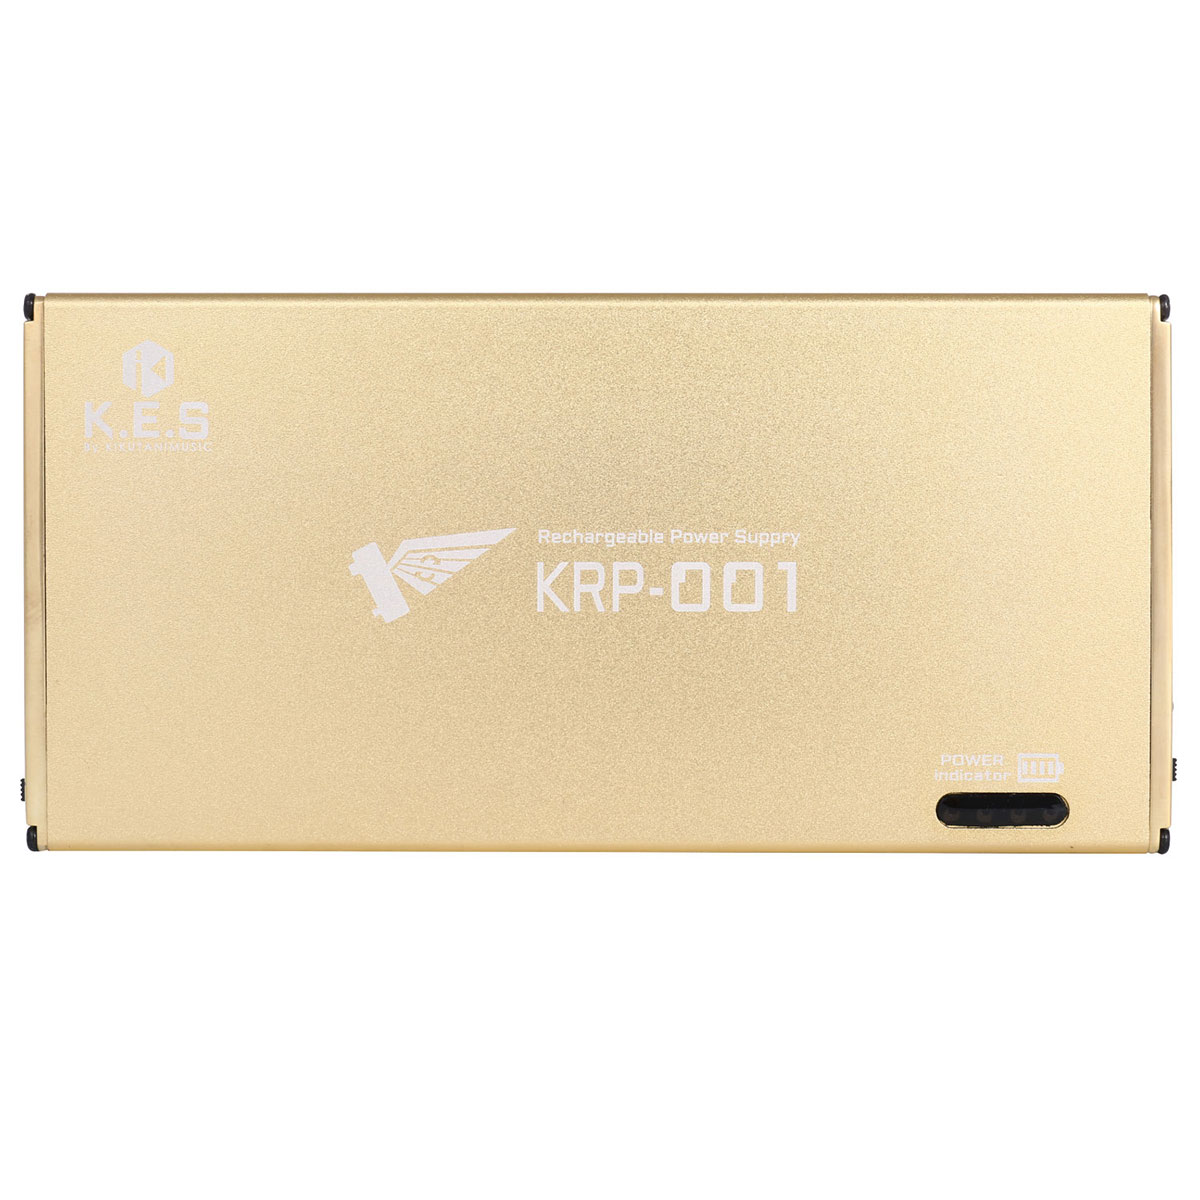 K.E.S. KRP-001 リチウムイオンバッテリー内蔵パワーサプライ